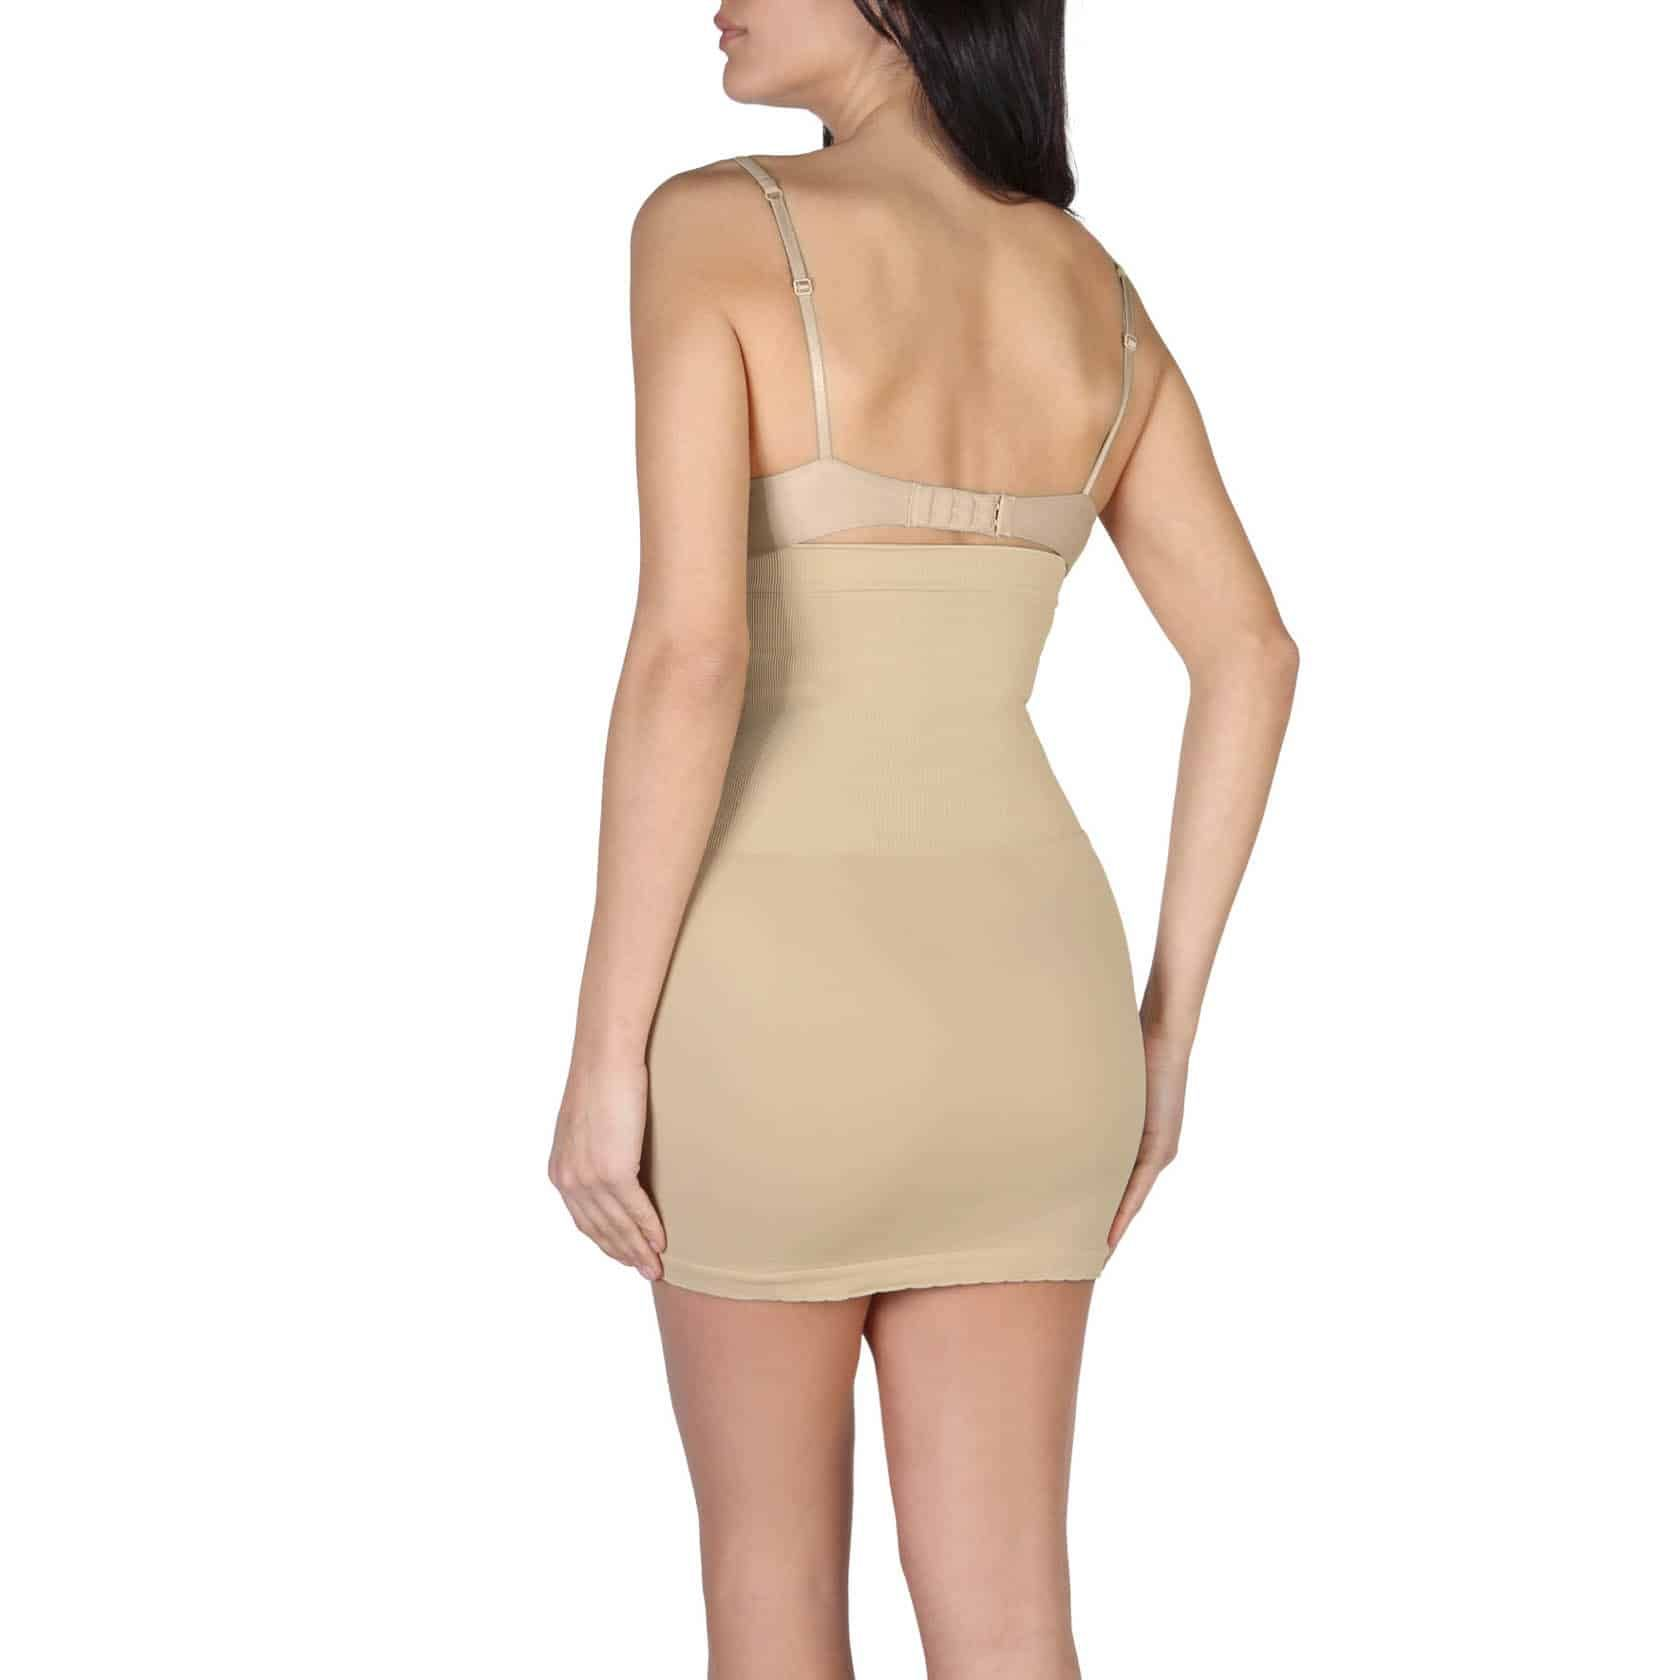 Shaping underwear Bodyboo – BB1090 – Braun